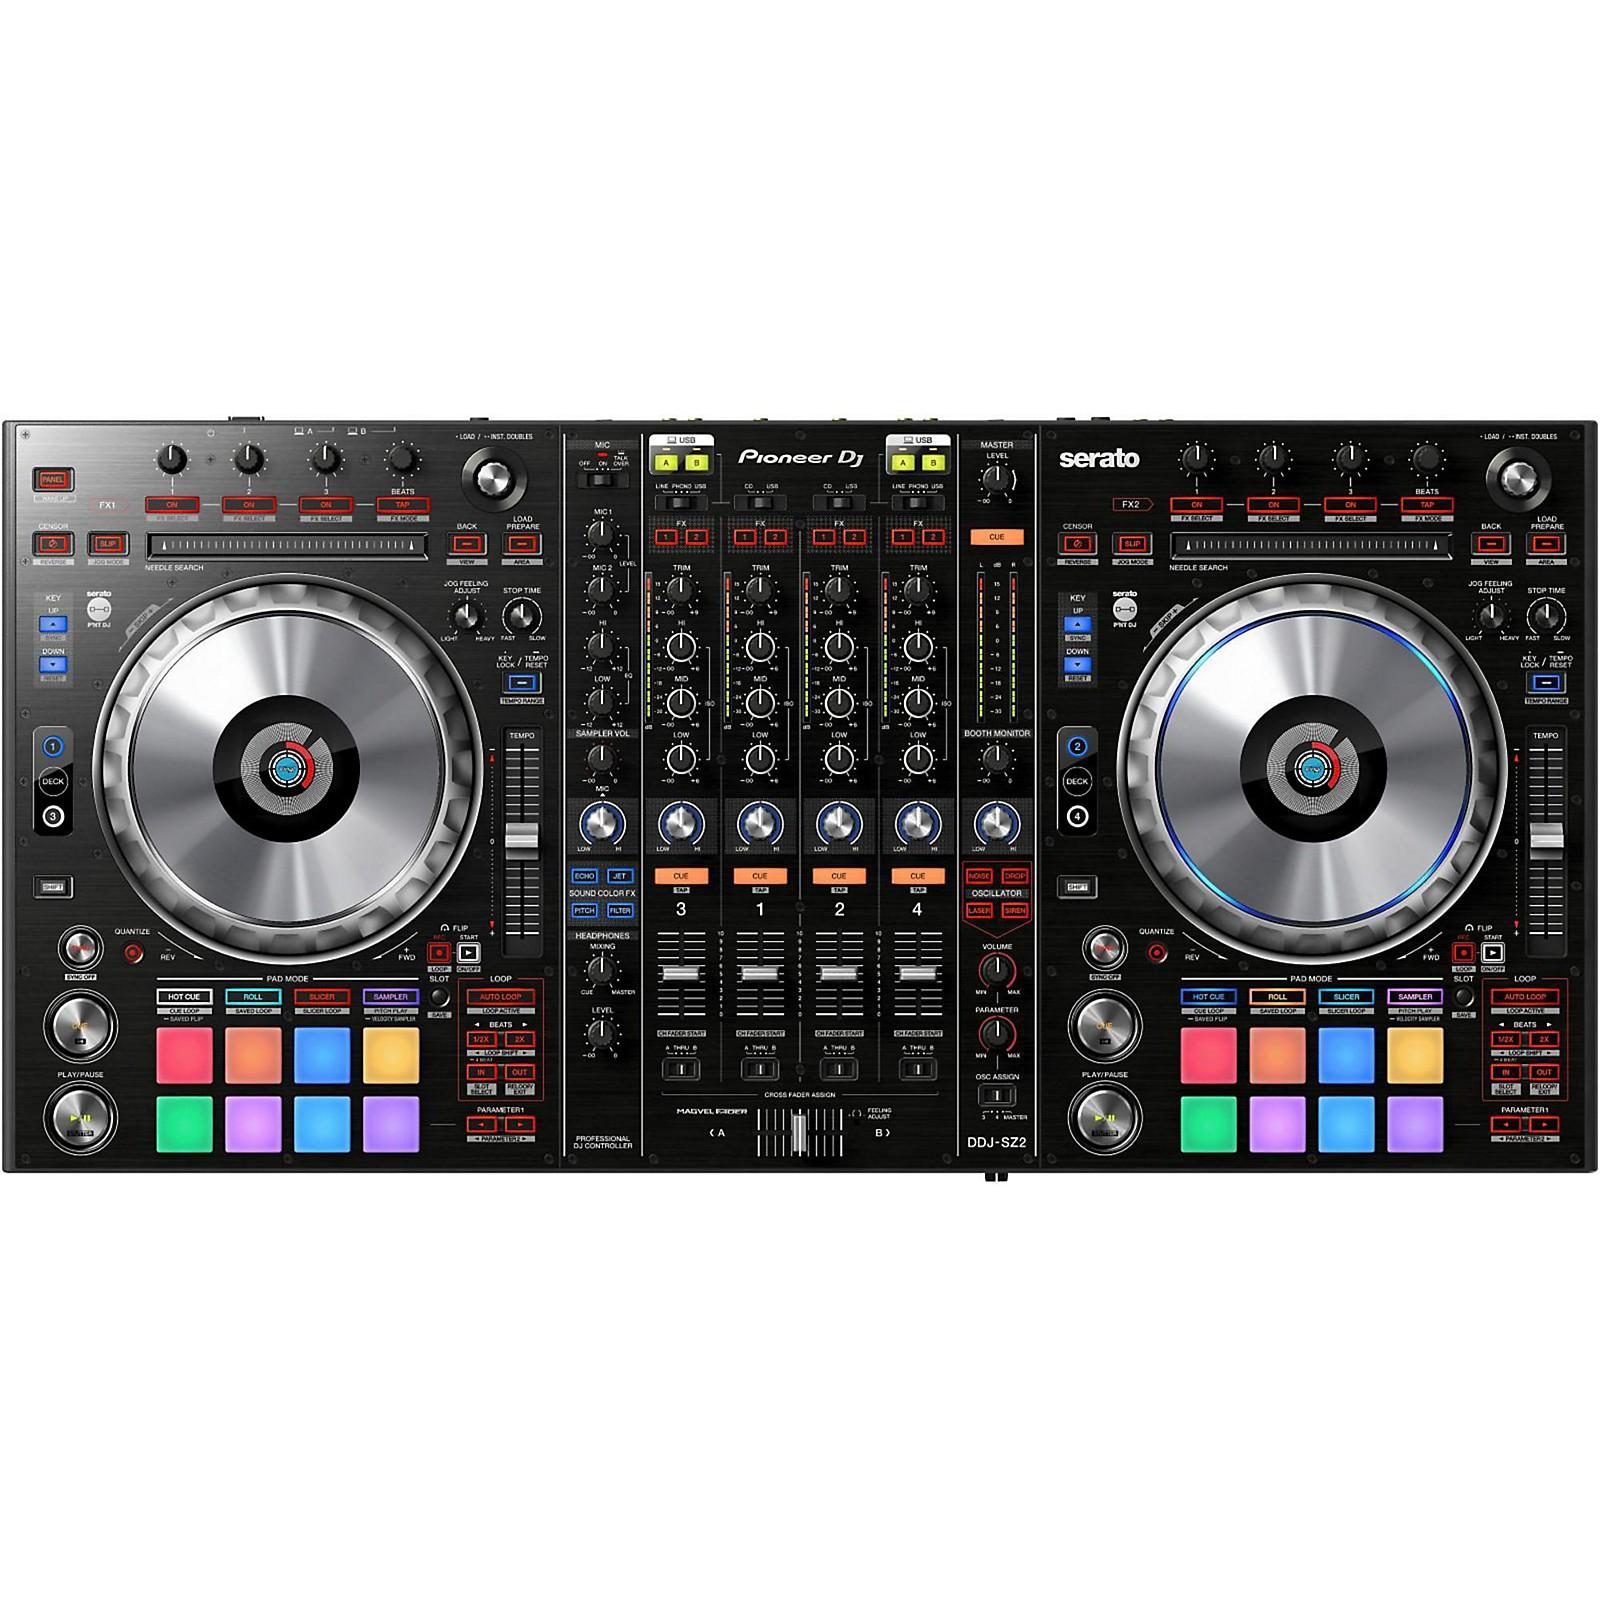 Open Box Pioneer DDJ-SZ2 Professional DJ Controller with Serato DJ